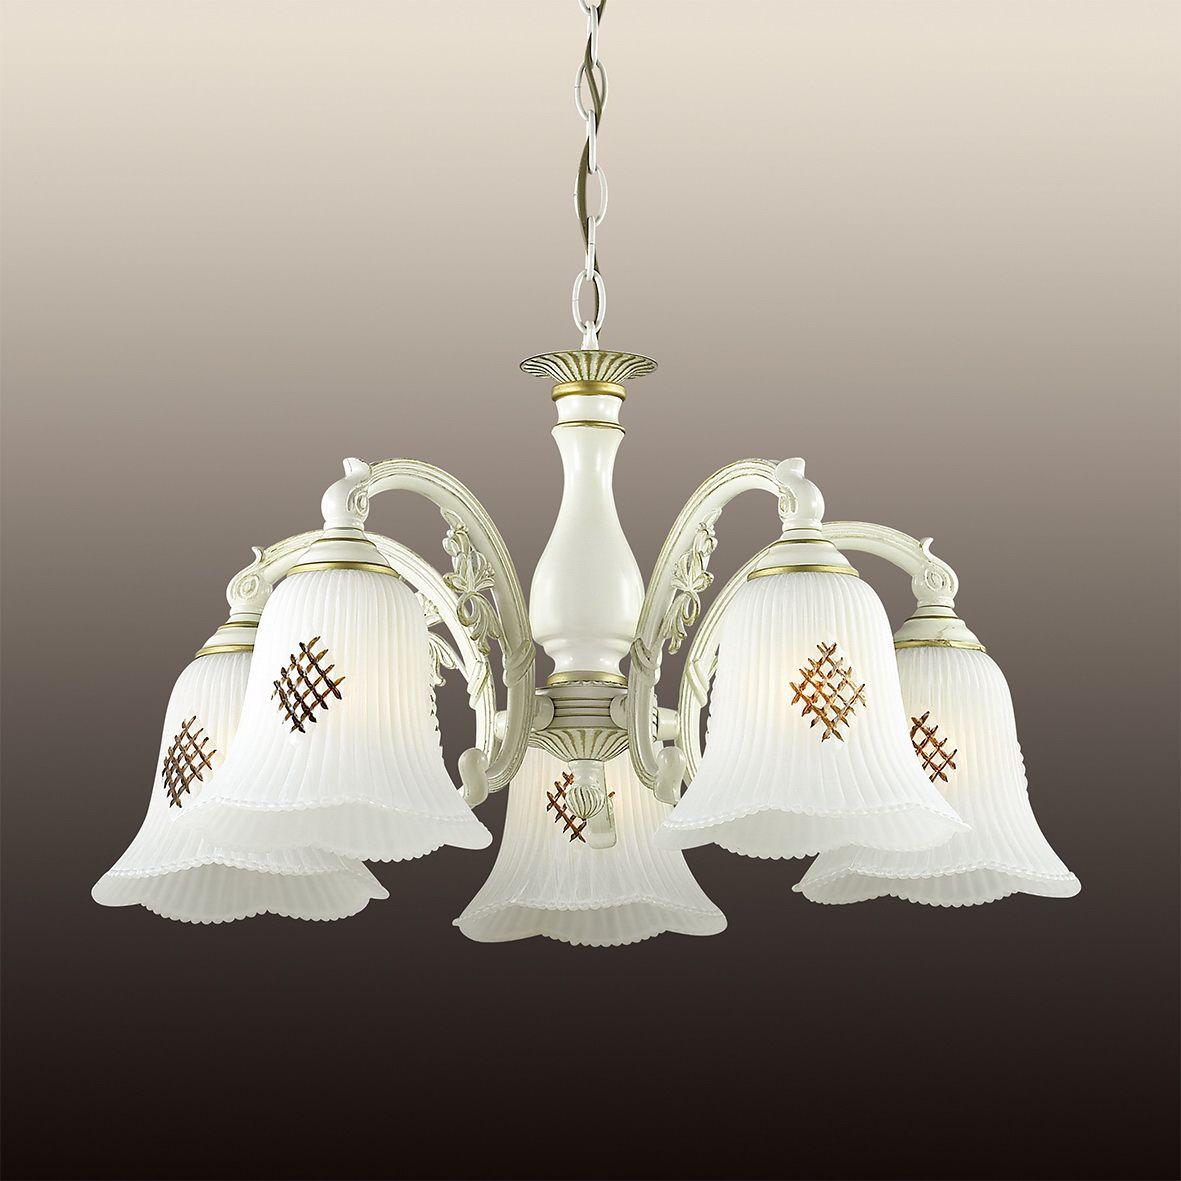 Люстра подвесная Odeon Light Savona, 5 х E27, 60W. 2946/52946/5